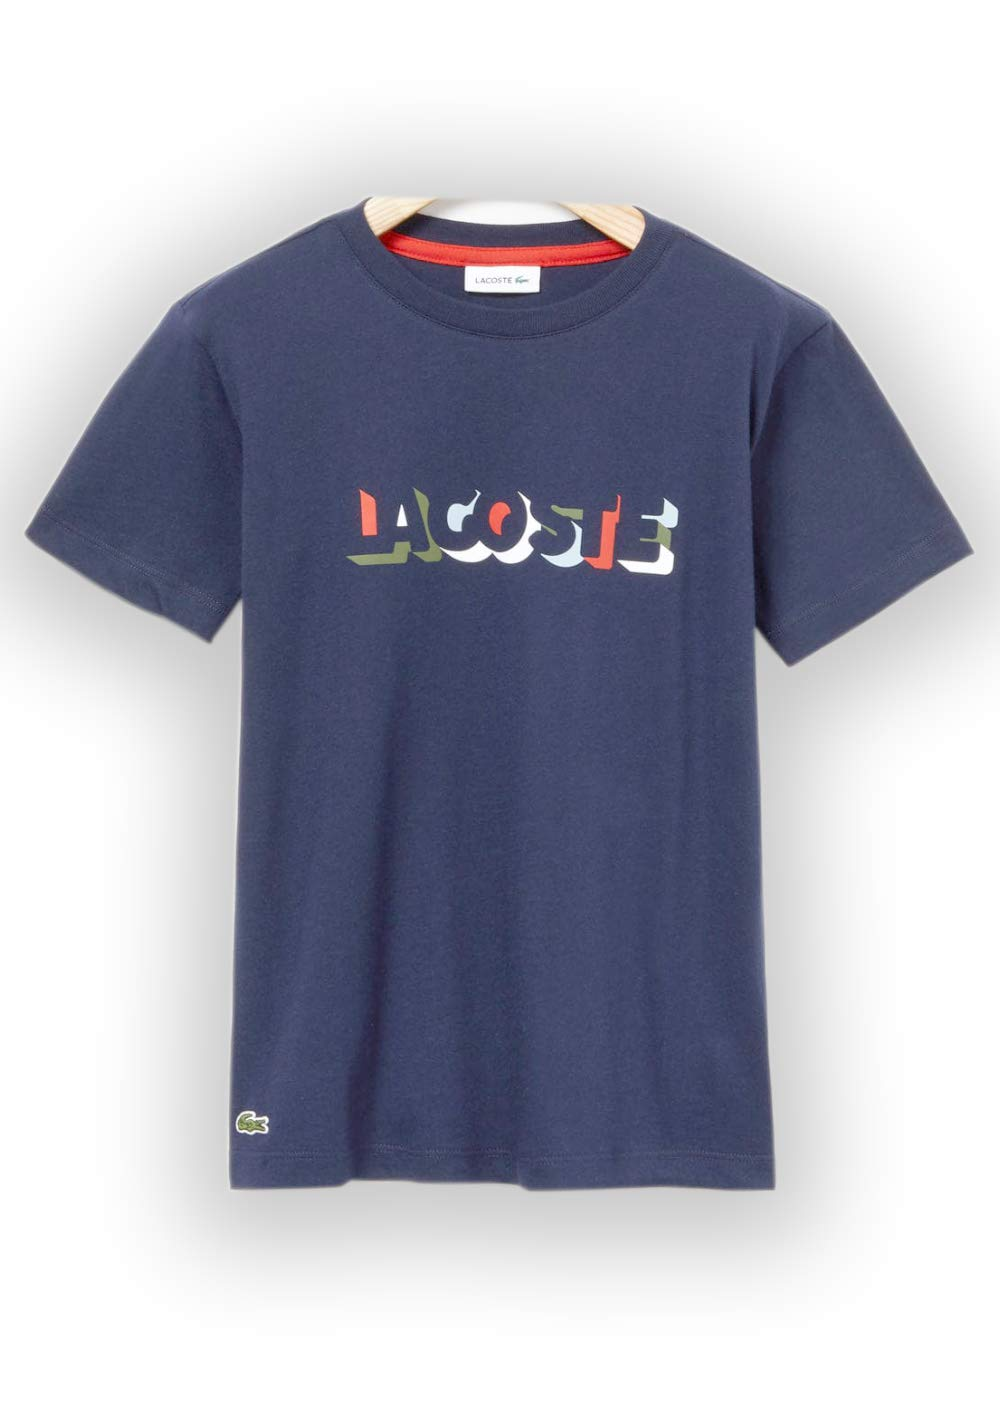 Lacoste Big BOY Multico Print T-Shirt, Navy Blue, 14YR